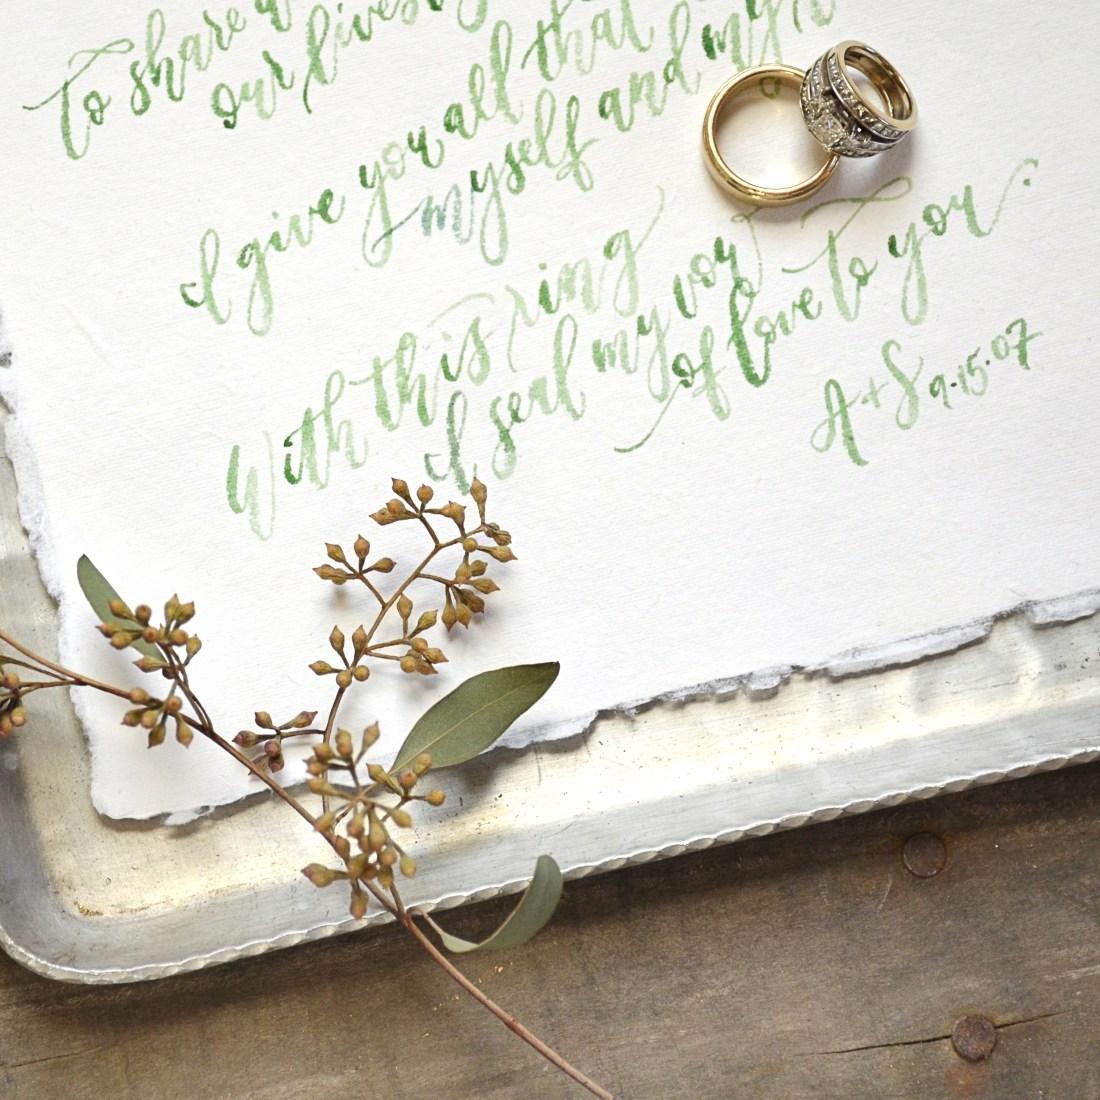 Sam Allen Creates Personal Wedding Vows Artwork on fabulous Fancy Pants paper